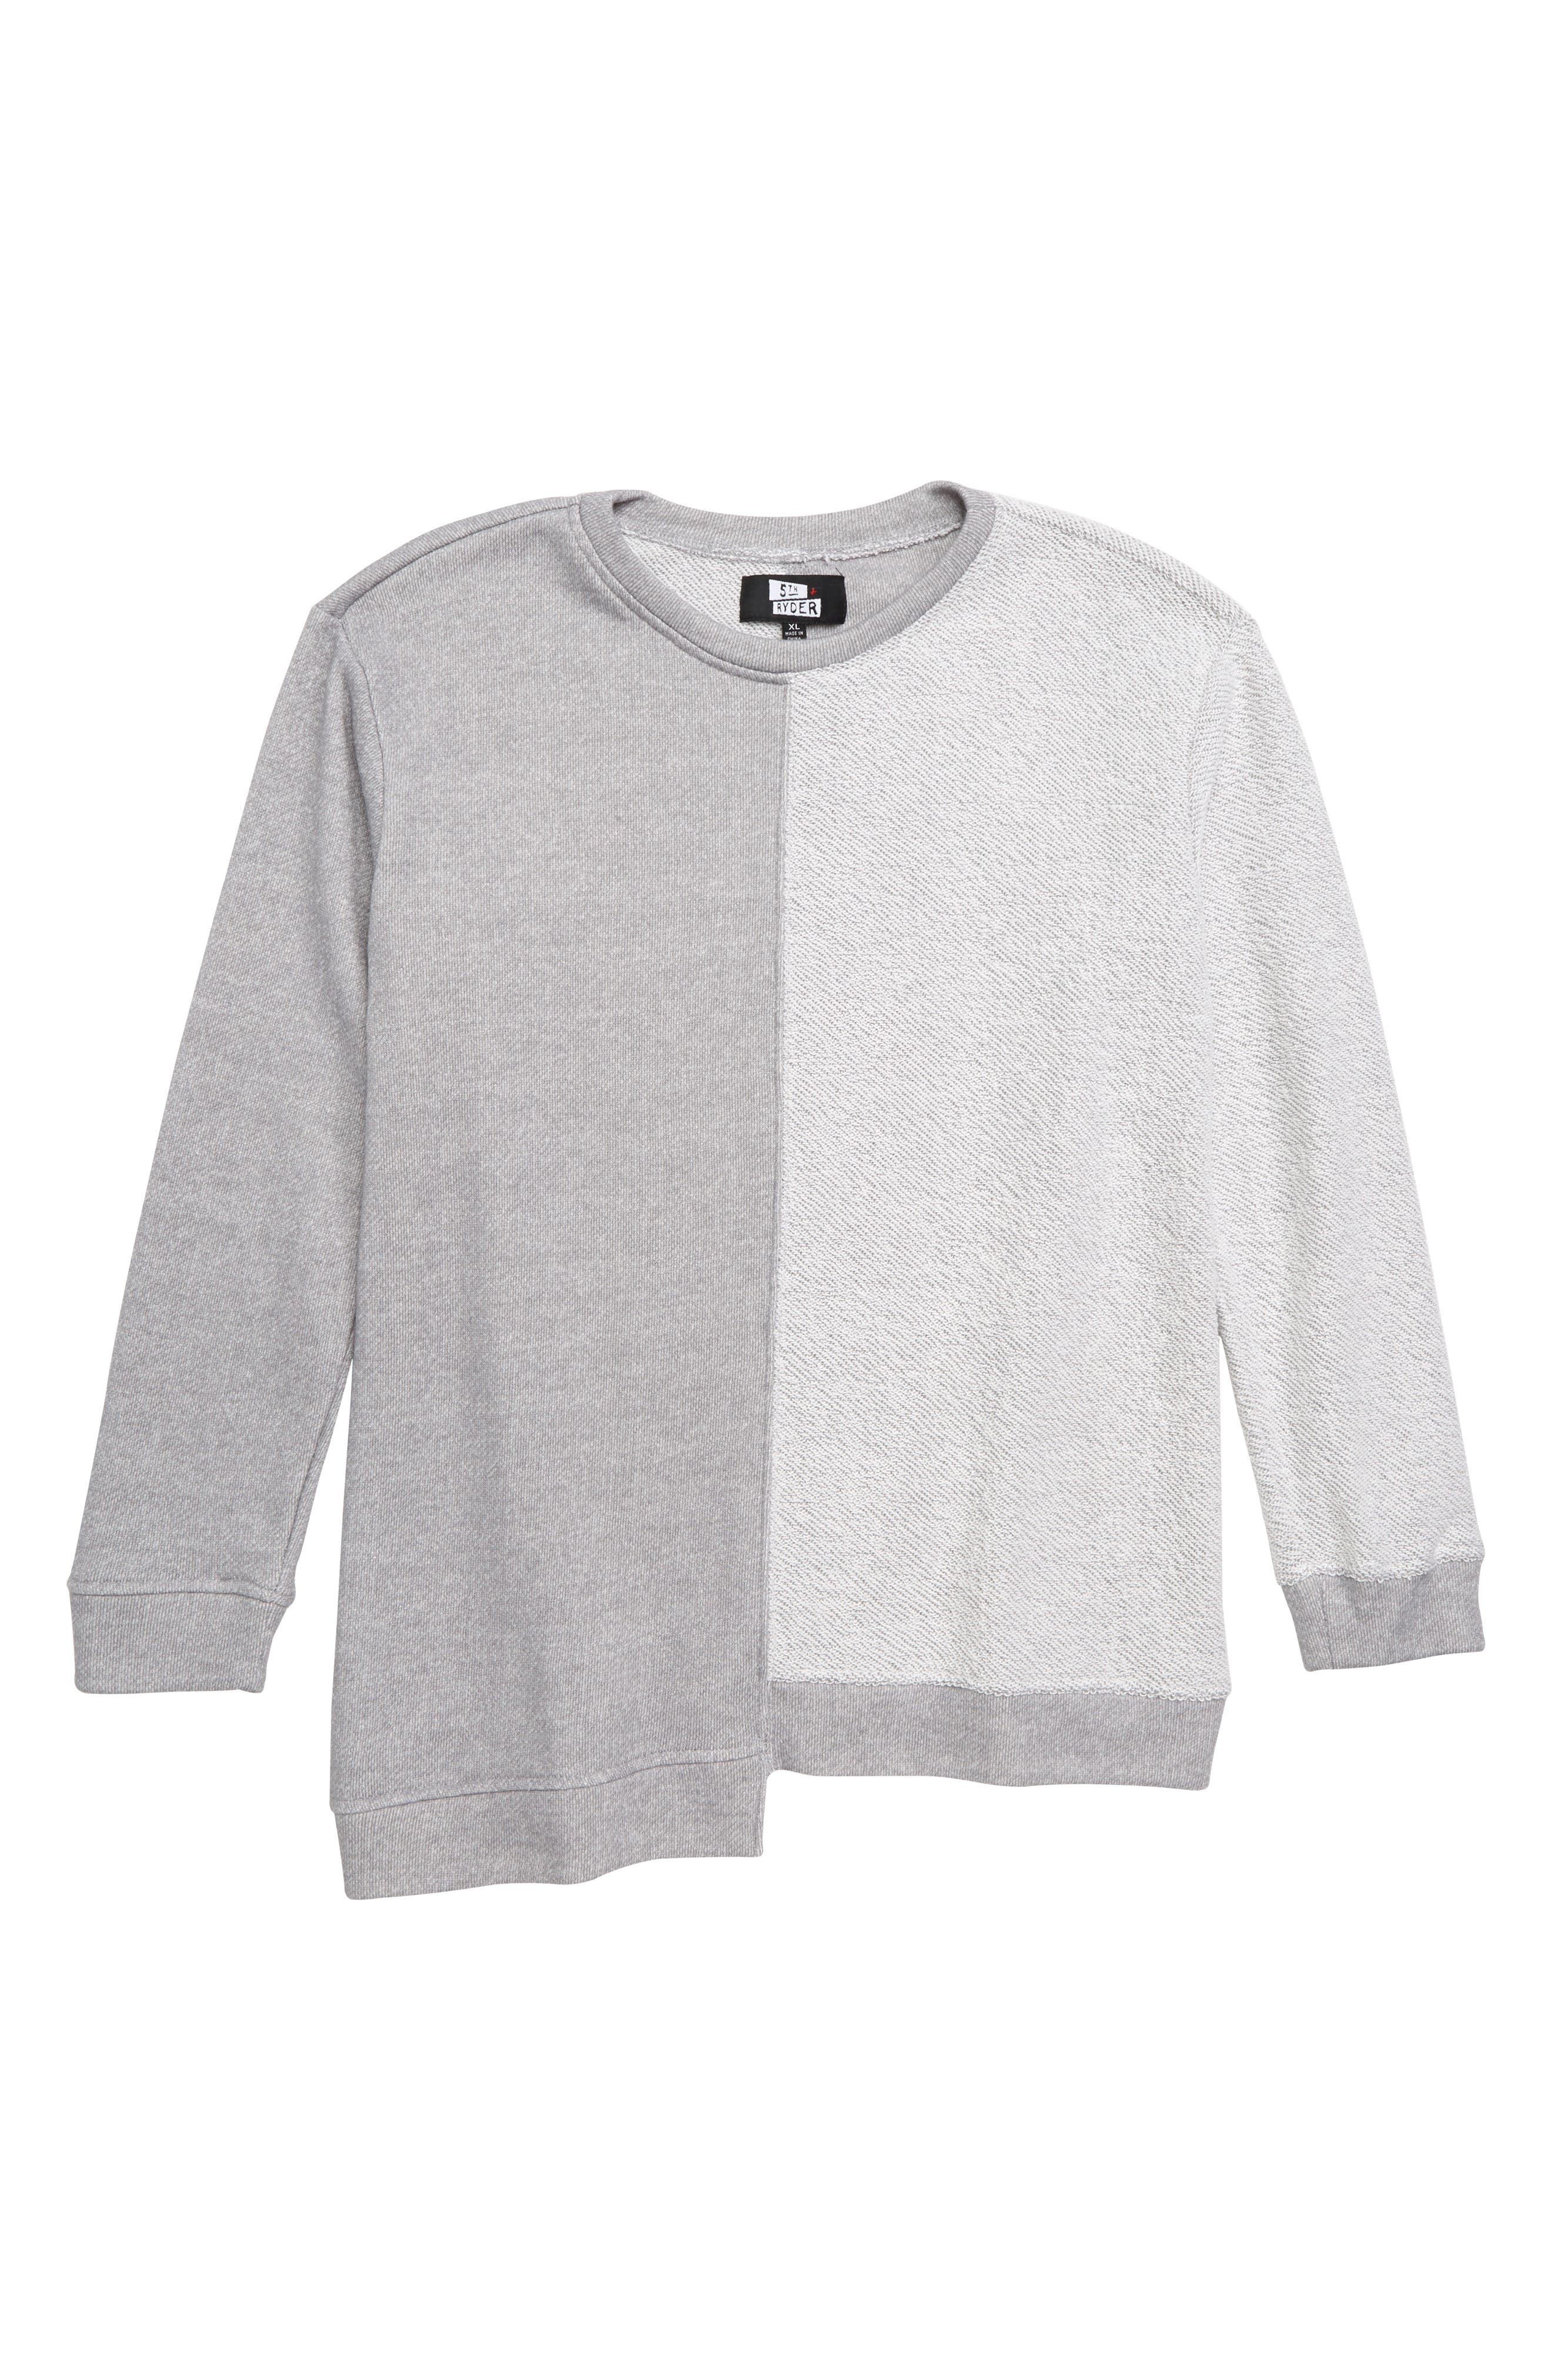 Elwood Splices Oversize Sweatshirt,                             Main thumbnail 1, color,                             HEATHER GREY